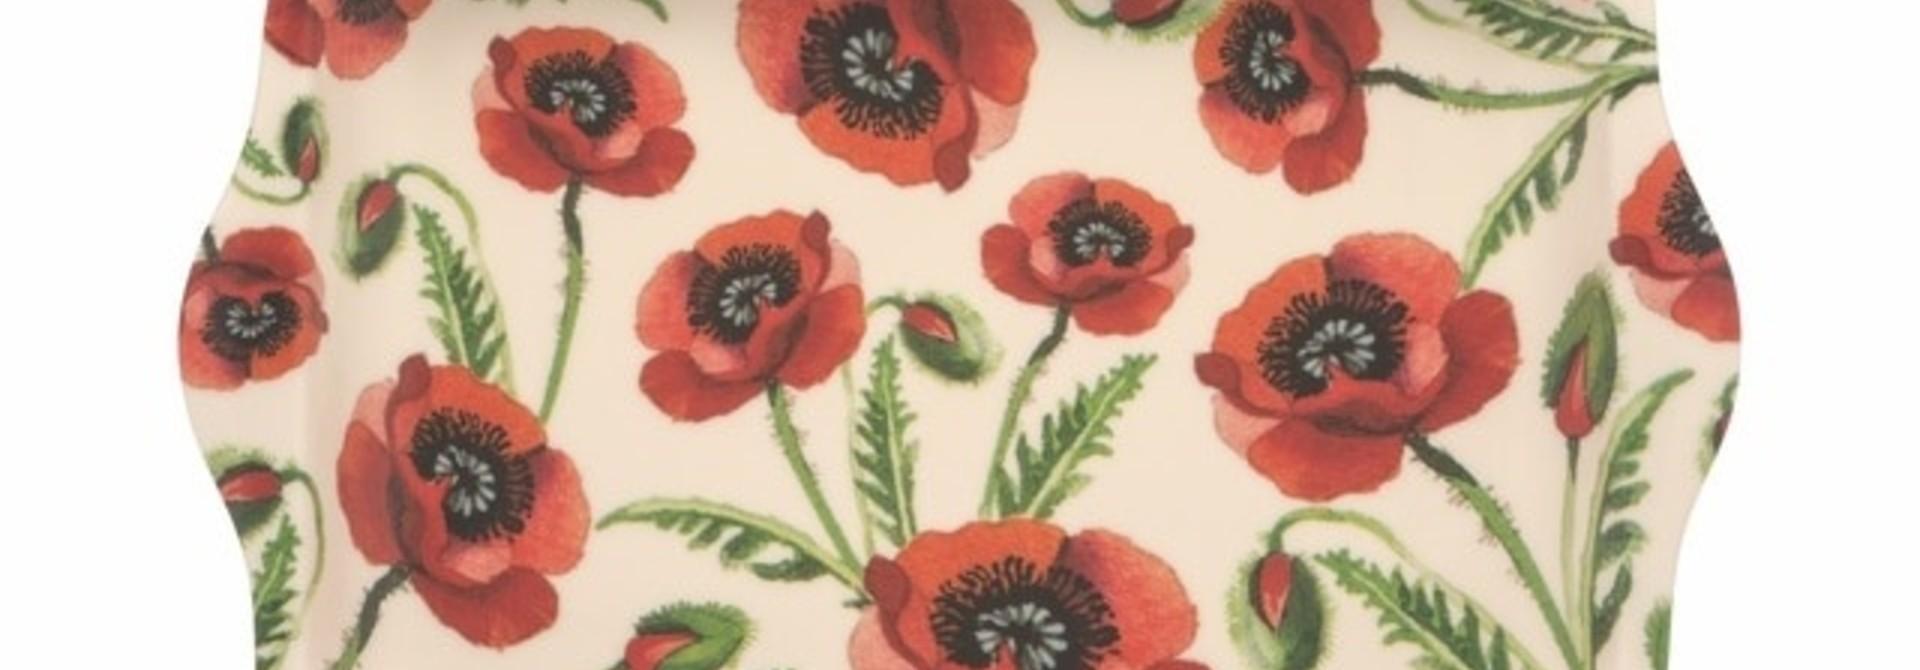 Poppies Tray - Small